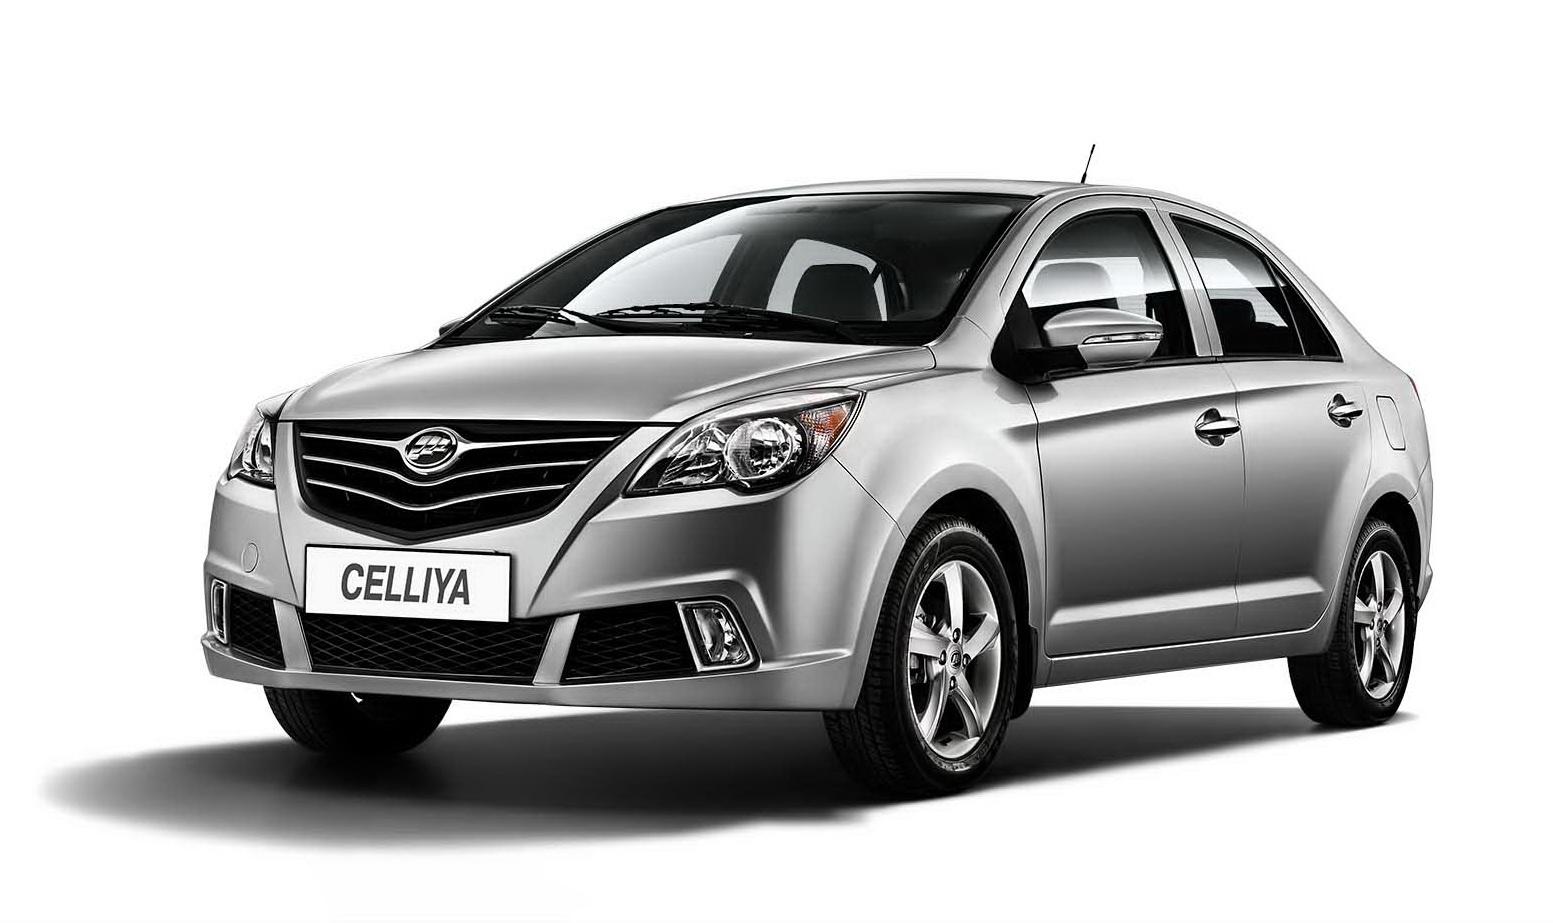 lifan-celliya-1